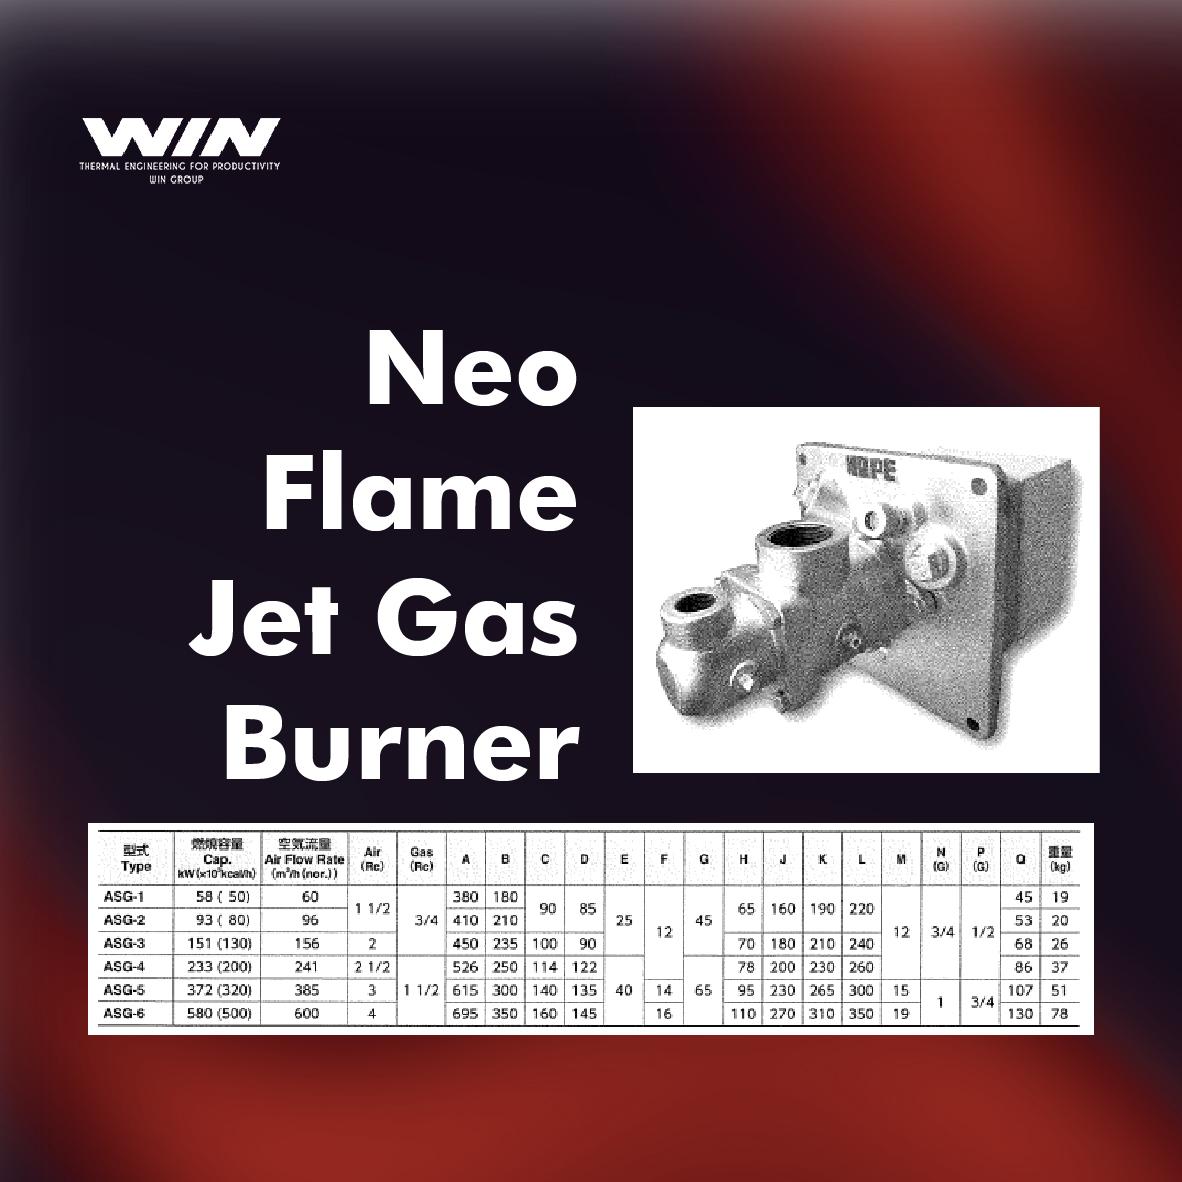 BURNER - WIN-09